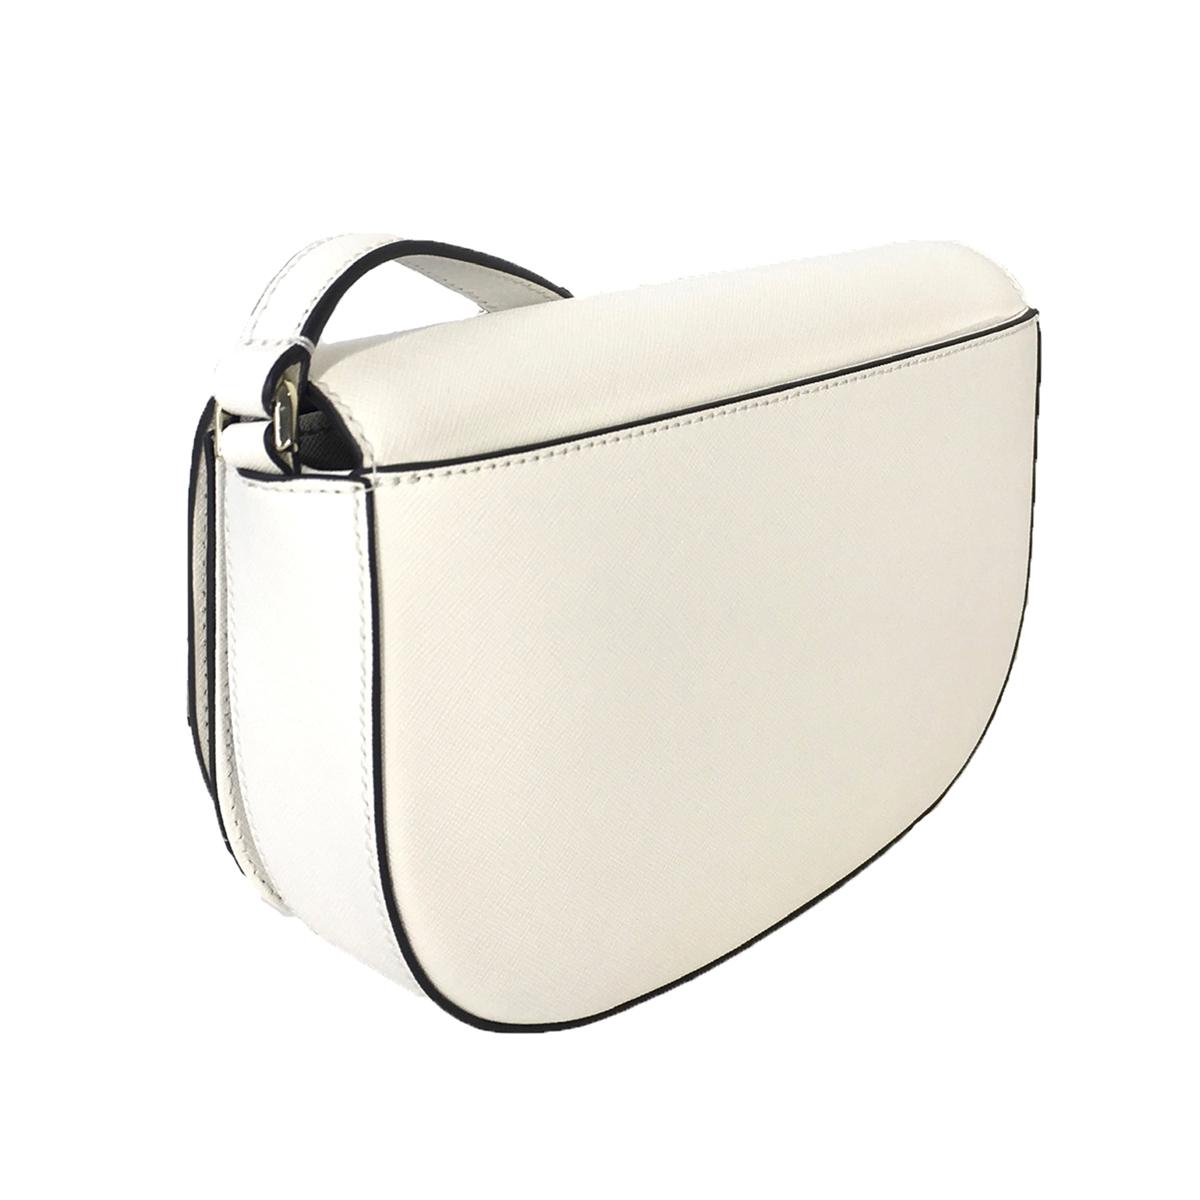 get cheap enjoy big discount for sale Kate Spade Raffia Flowers Reiley Leather Crossbody Bag , Bright White Multi